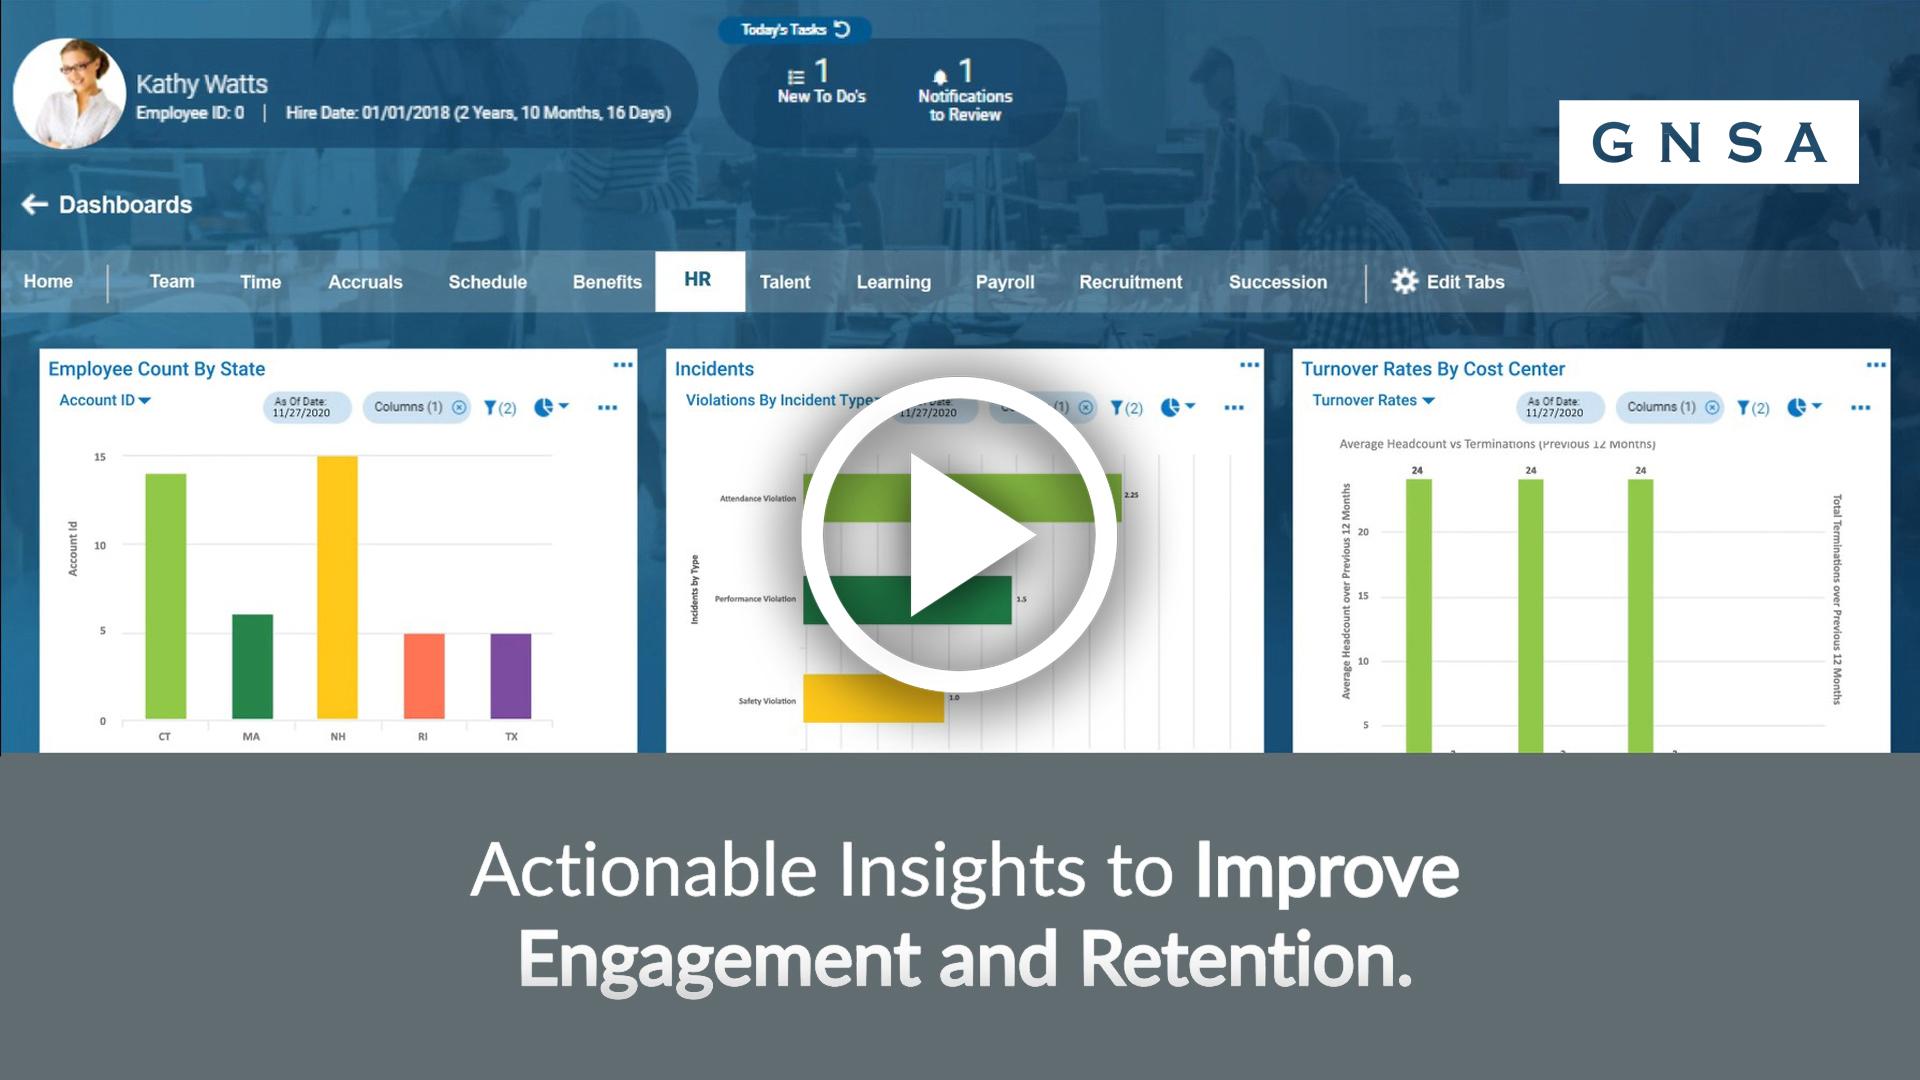 GNSA HR Software Video Overview